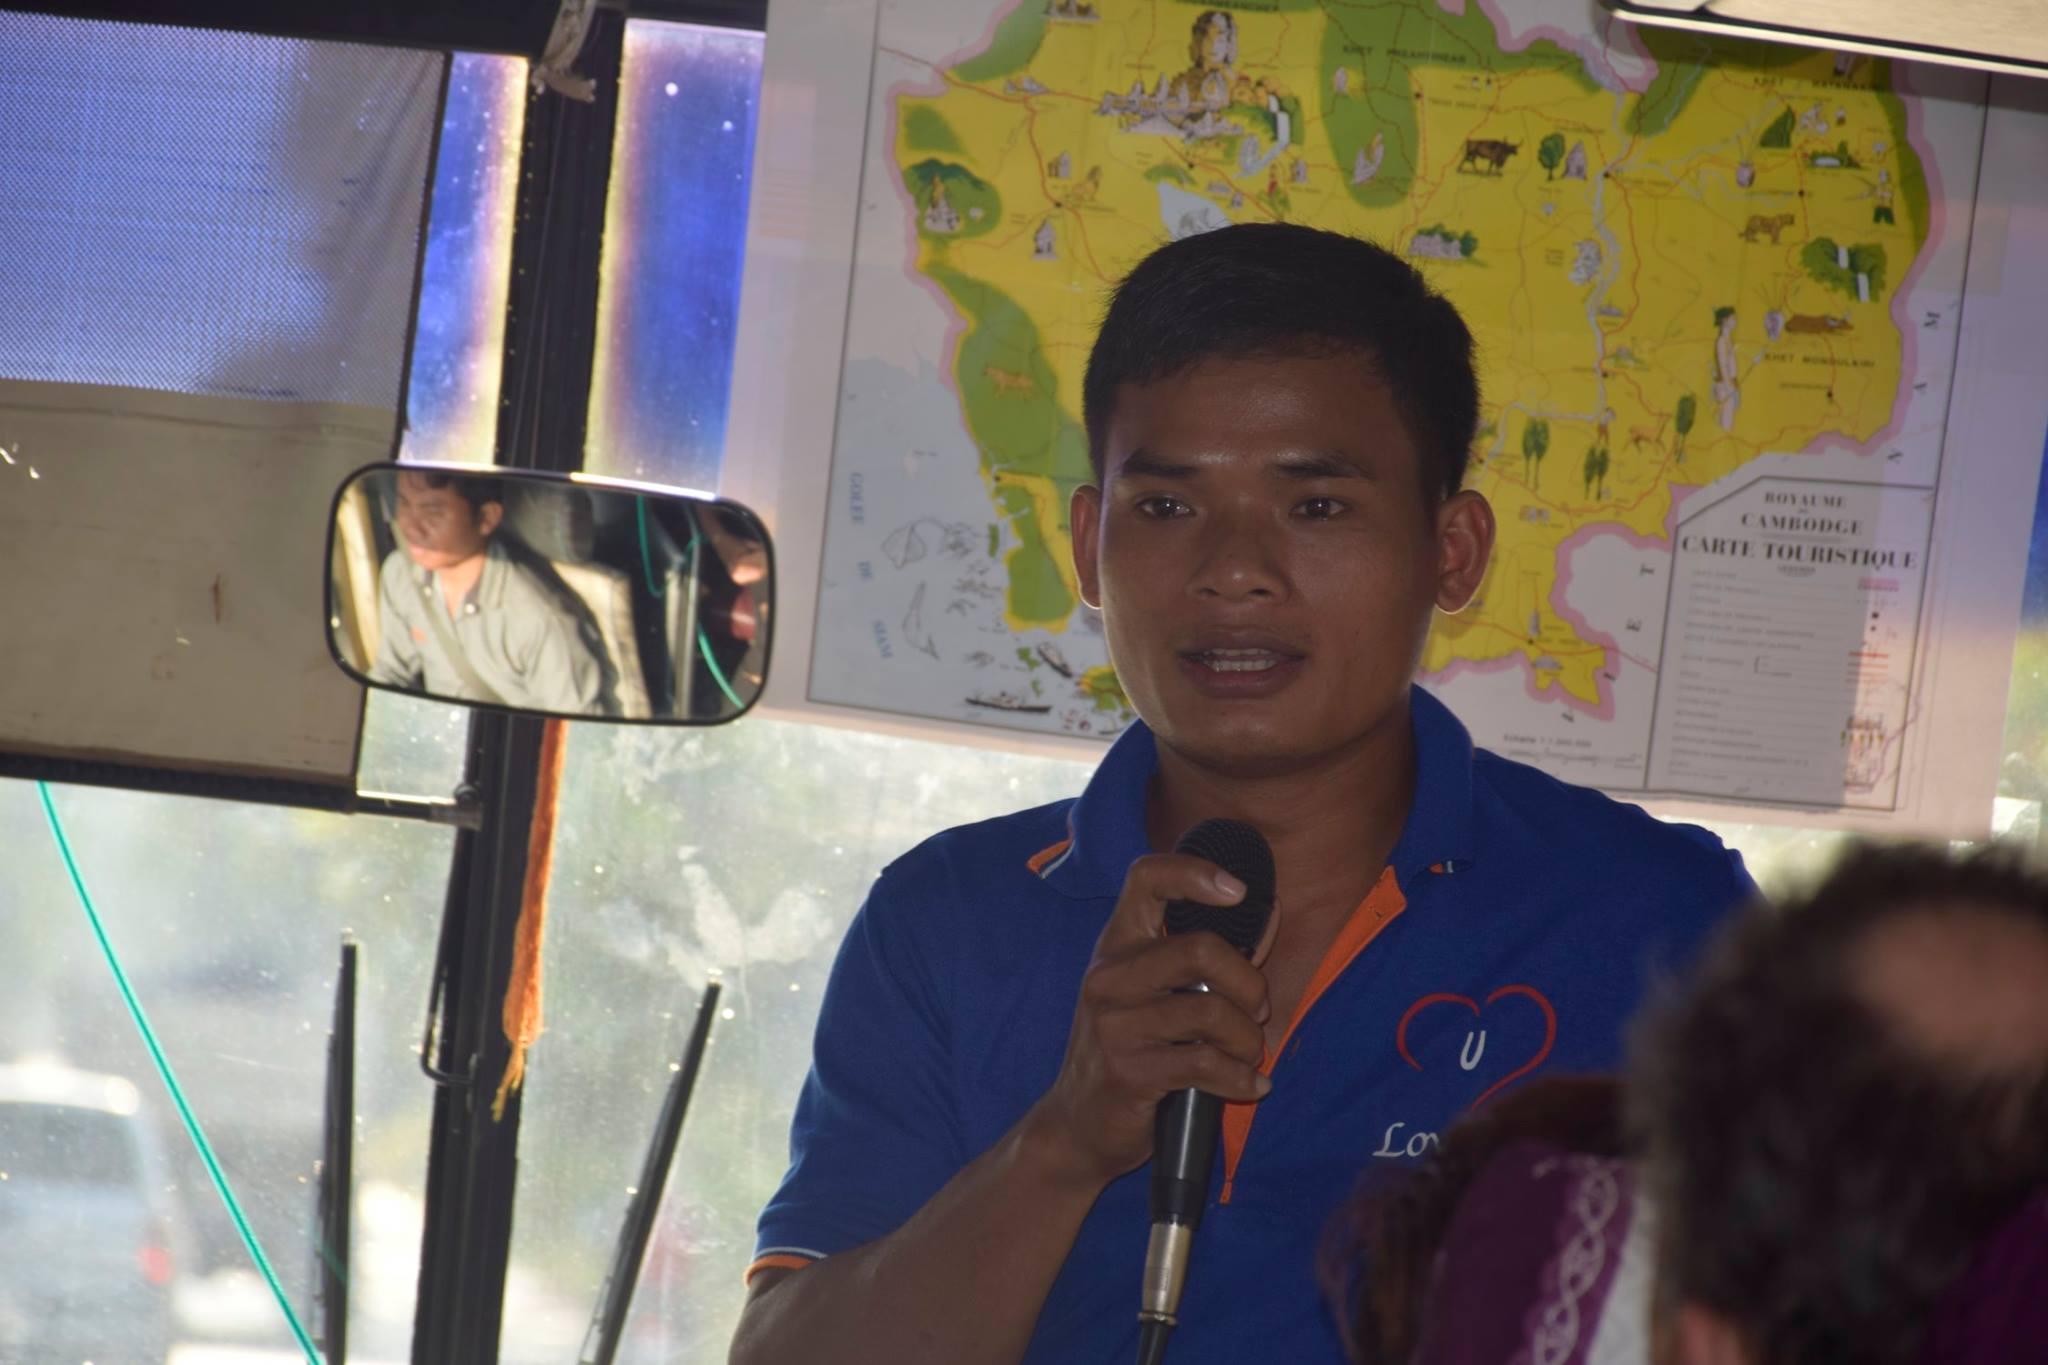 le responsable de ce volontariat au Cambodge